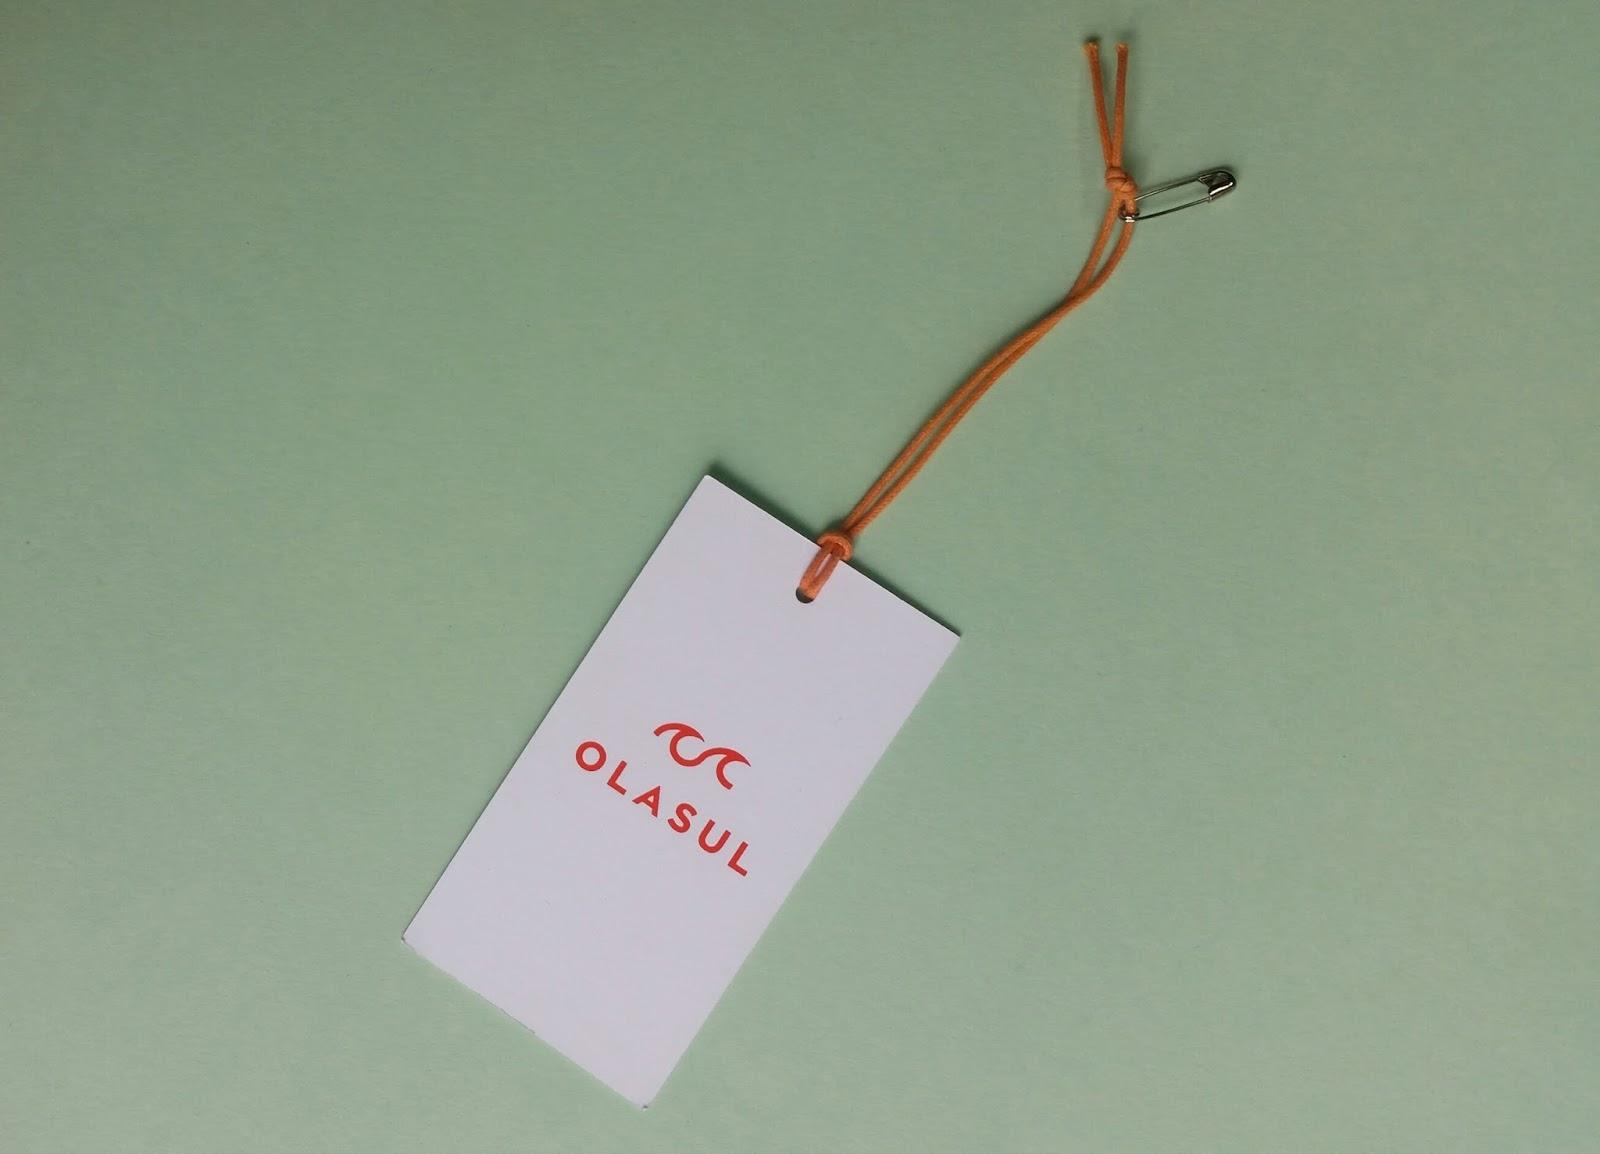 rjr custom paper hanging inc.